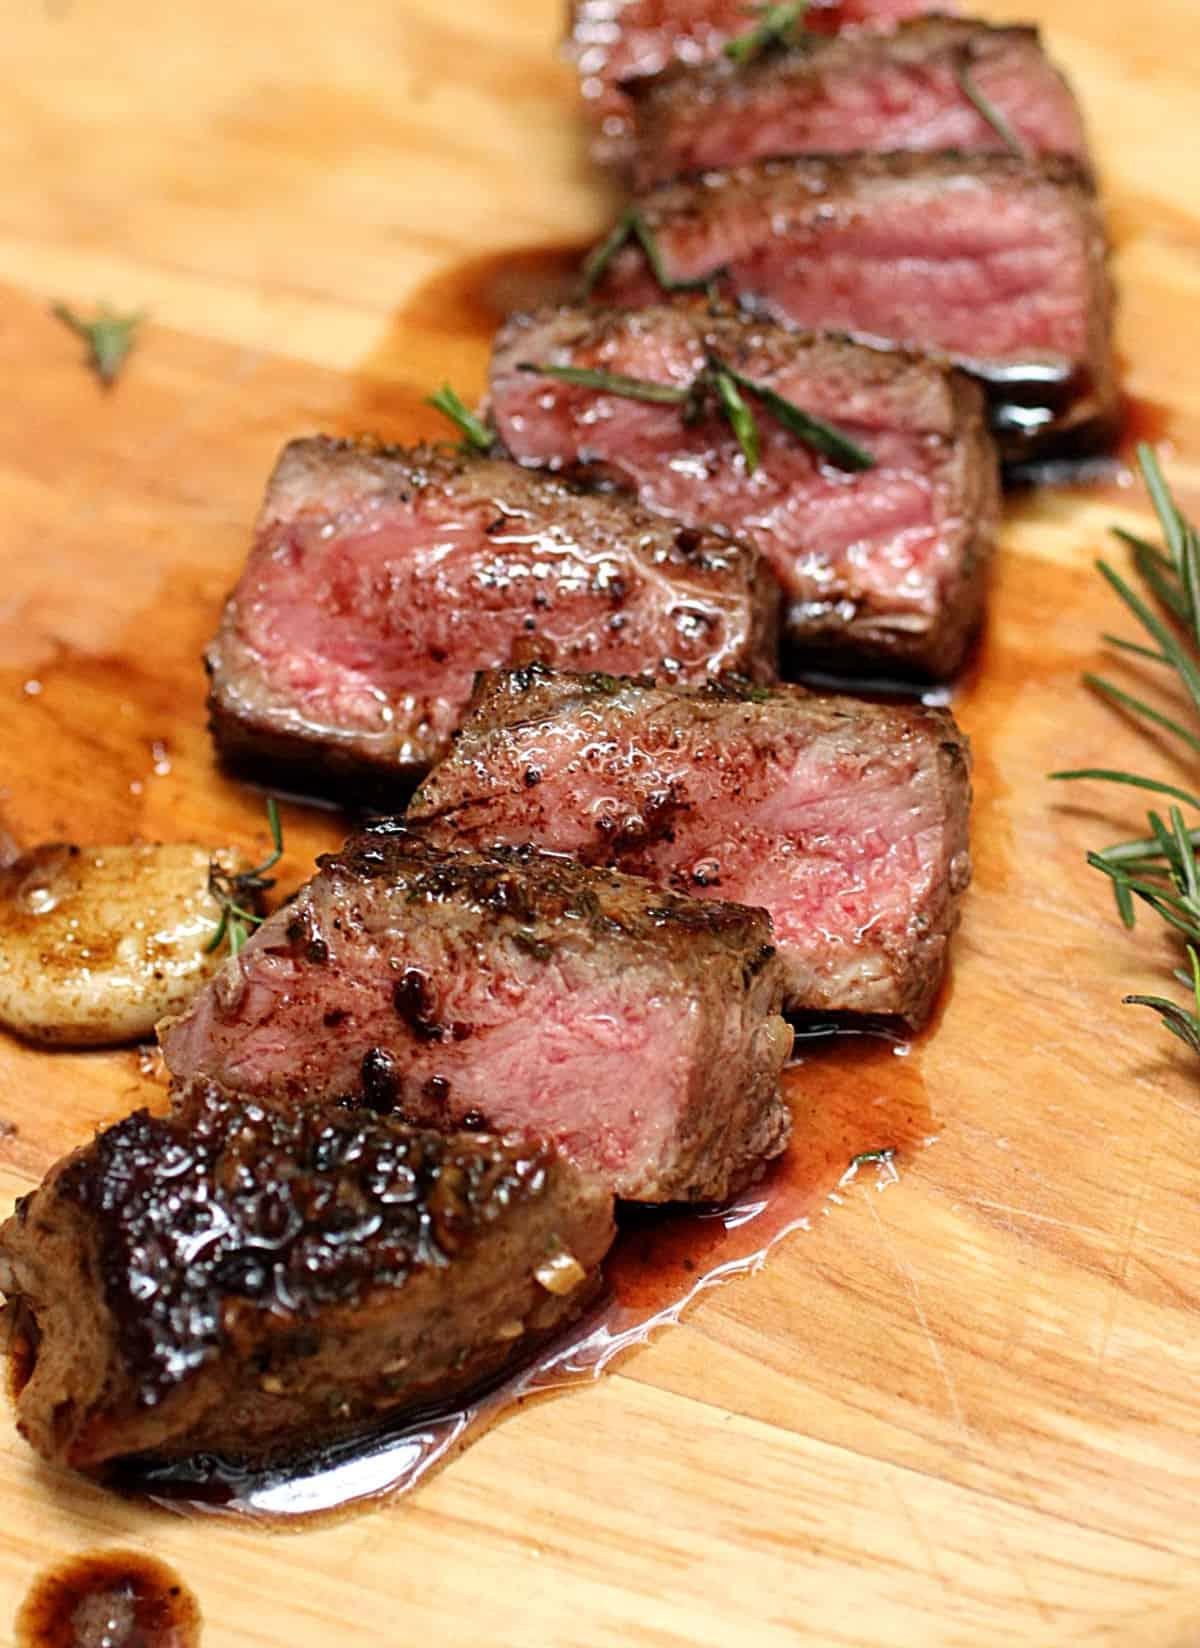 Cut pieces of juicy Rosemary Garlic Butter Steak on wooden board